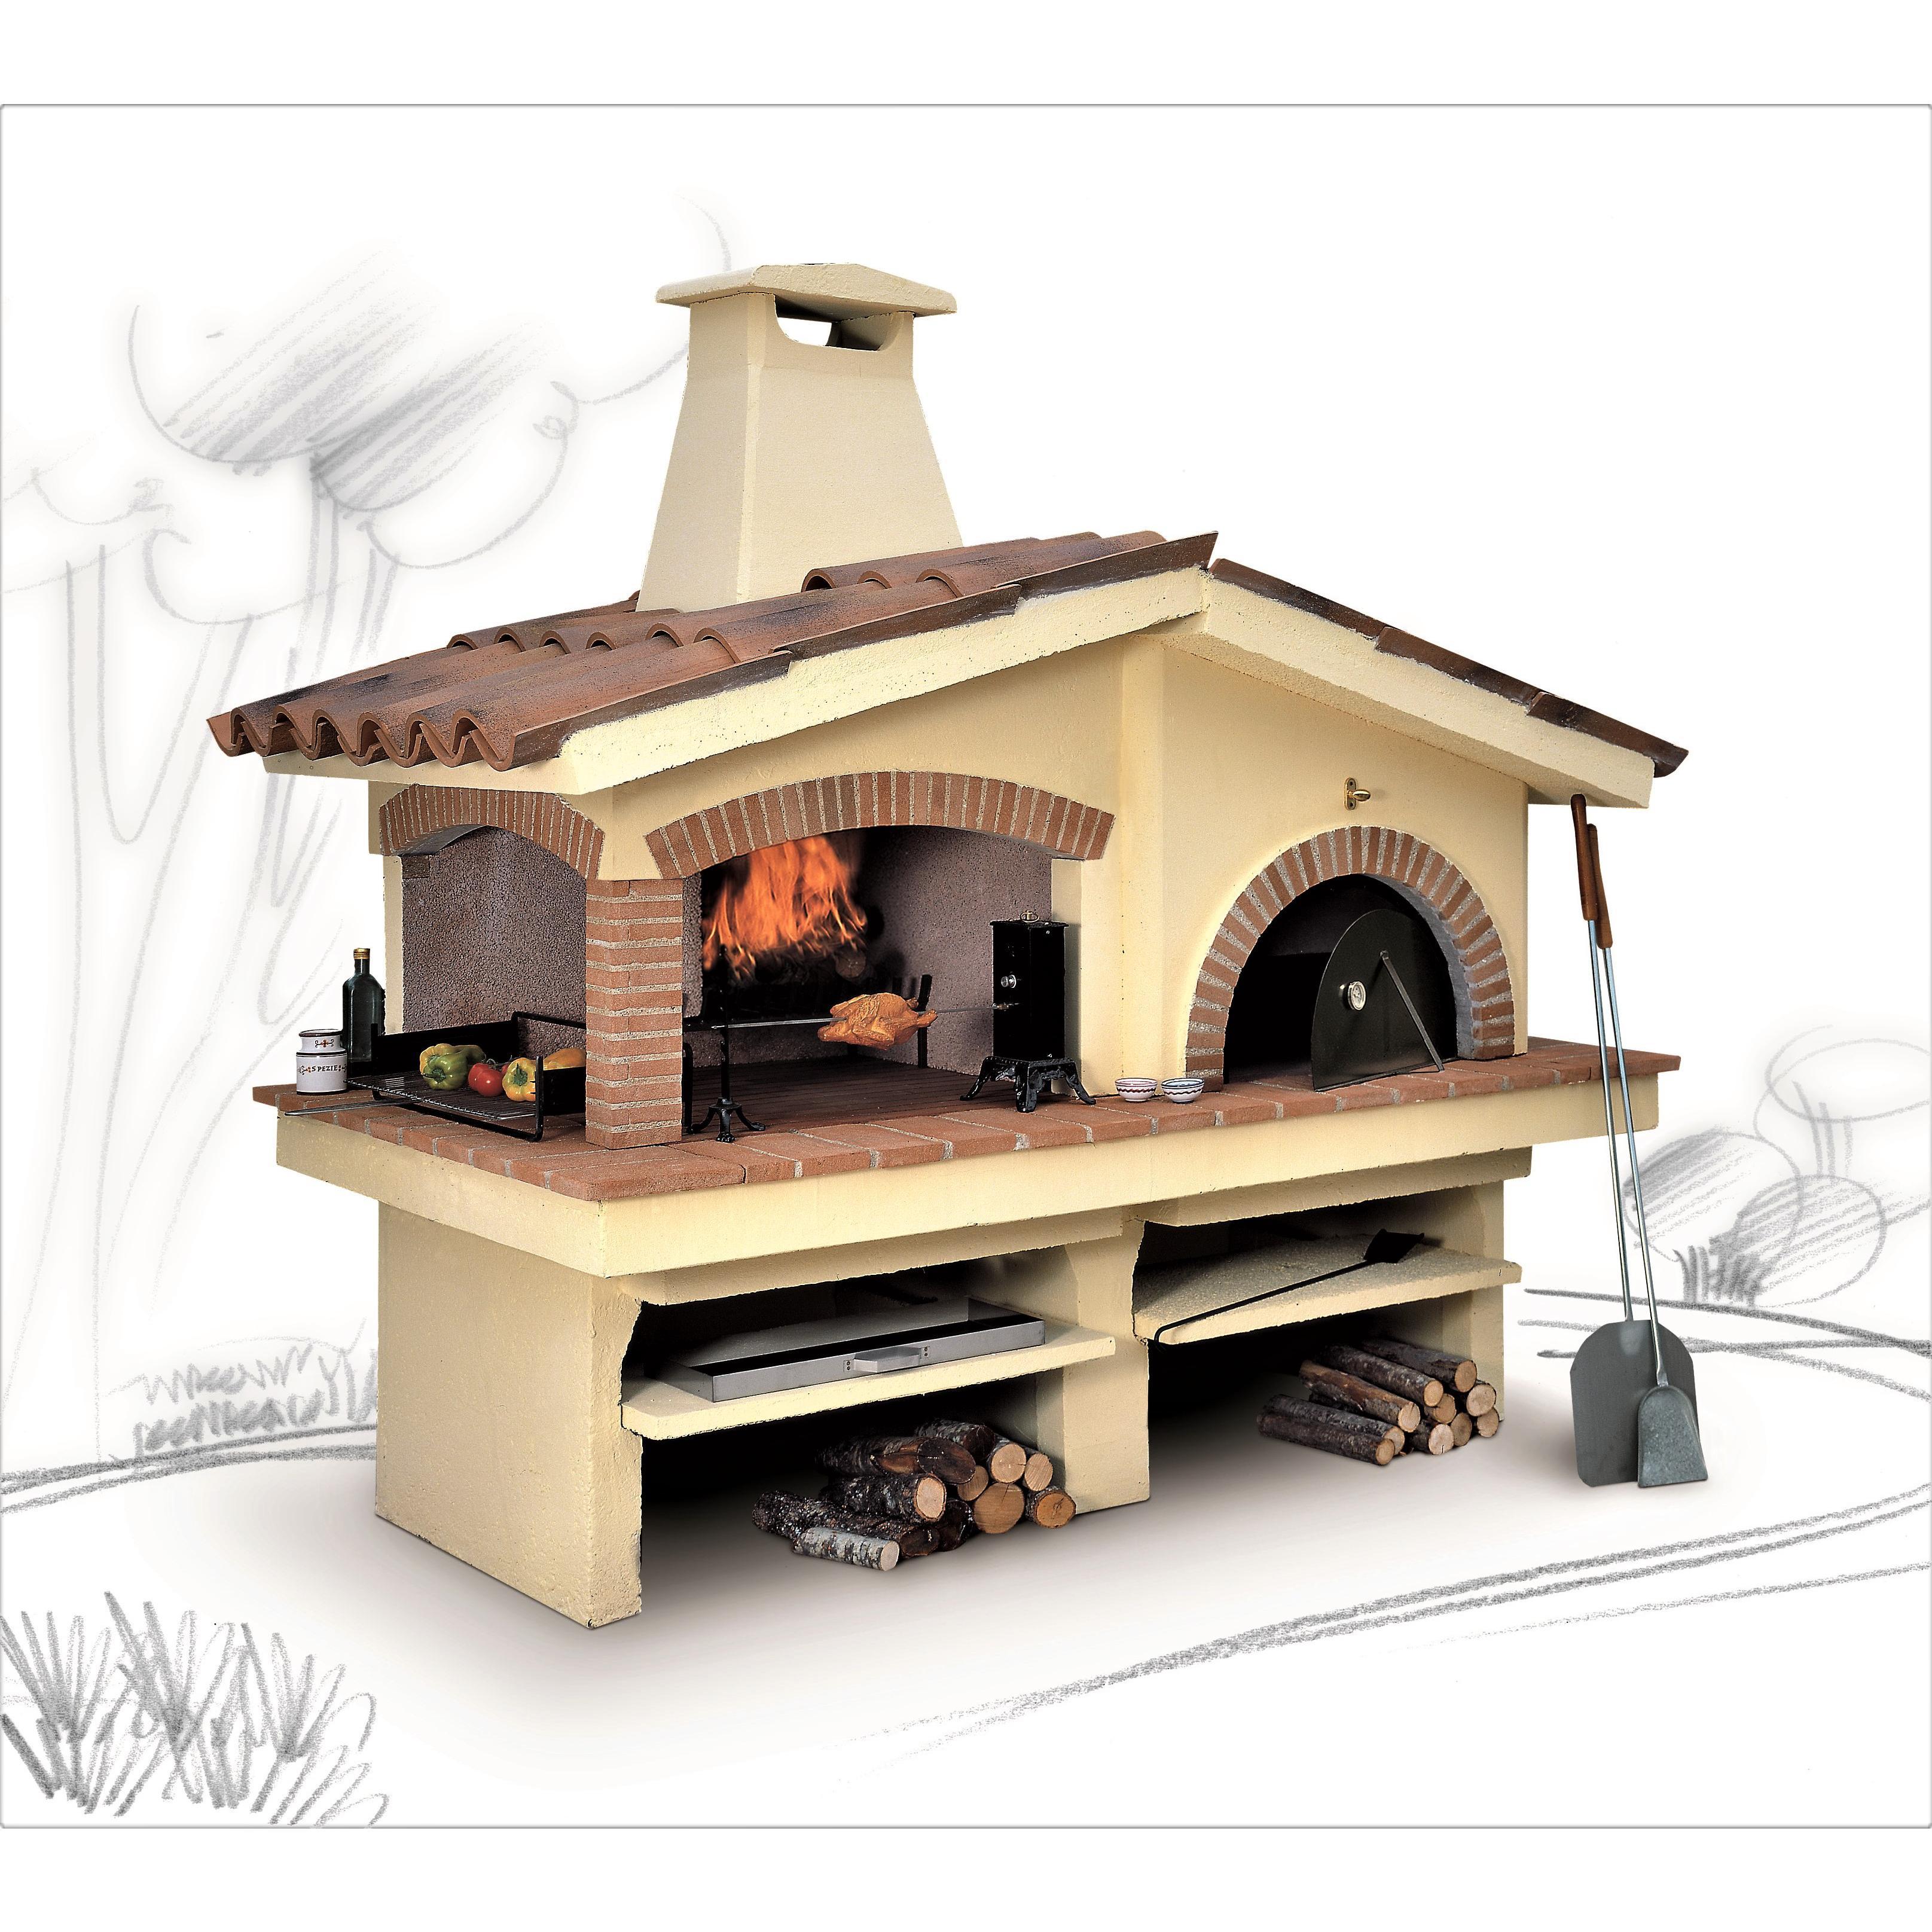 Forno A Legna Con Camino barbecue con forno eden